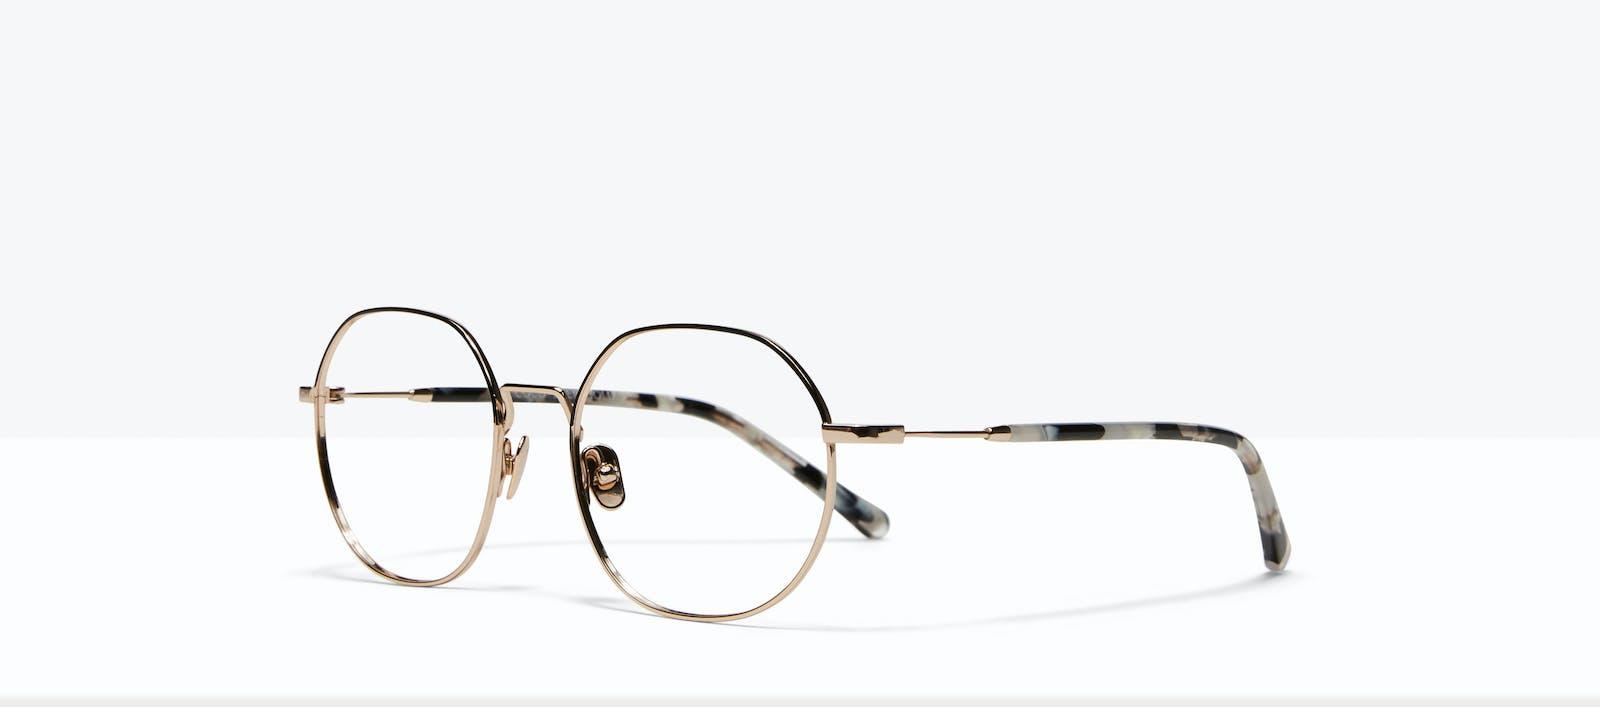 b7504d65b2 Affordable Fashion Glasses Round Eyeglasses Women Coco Deep Gold Tilt